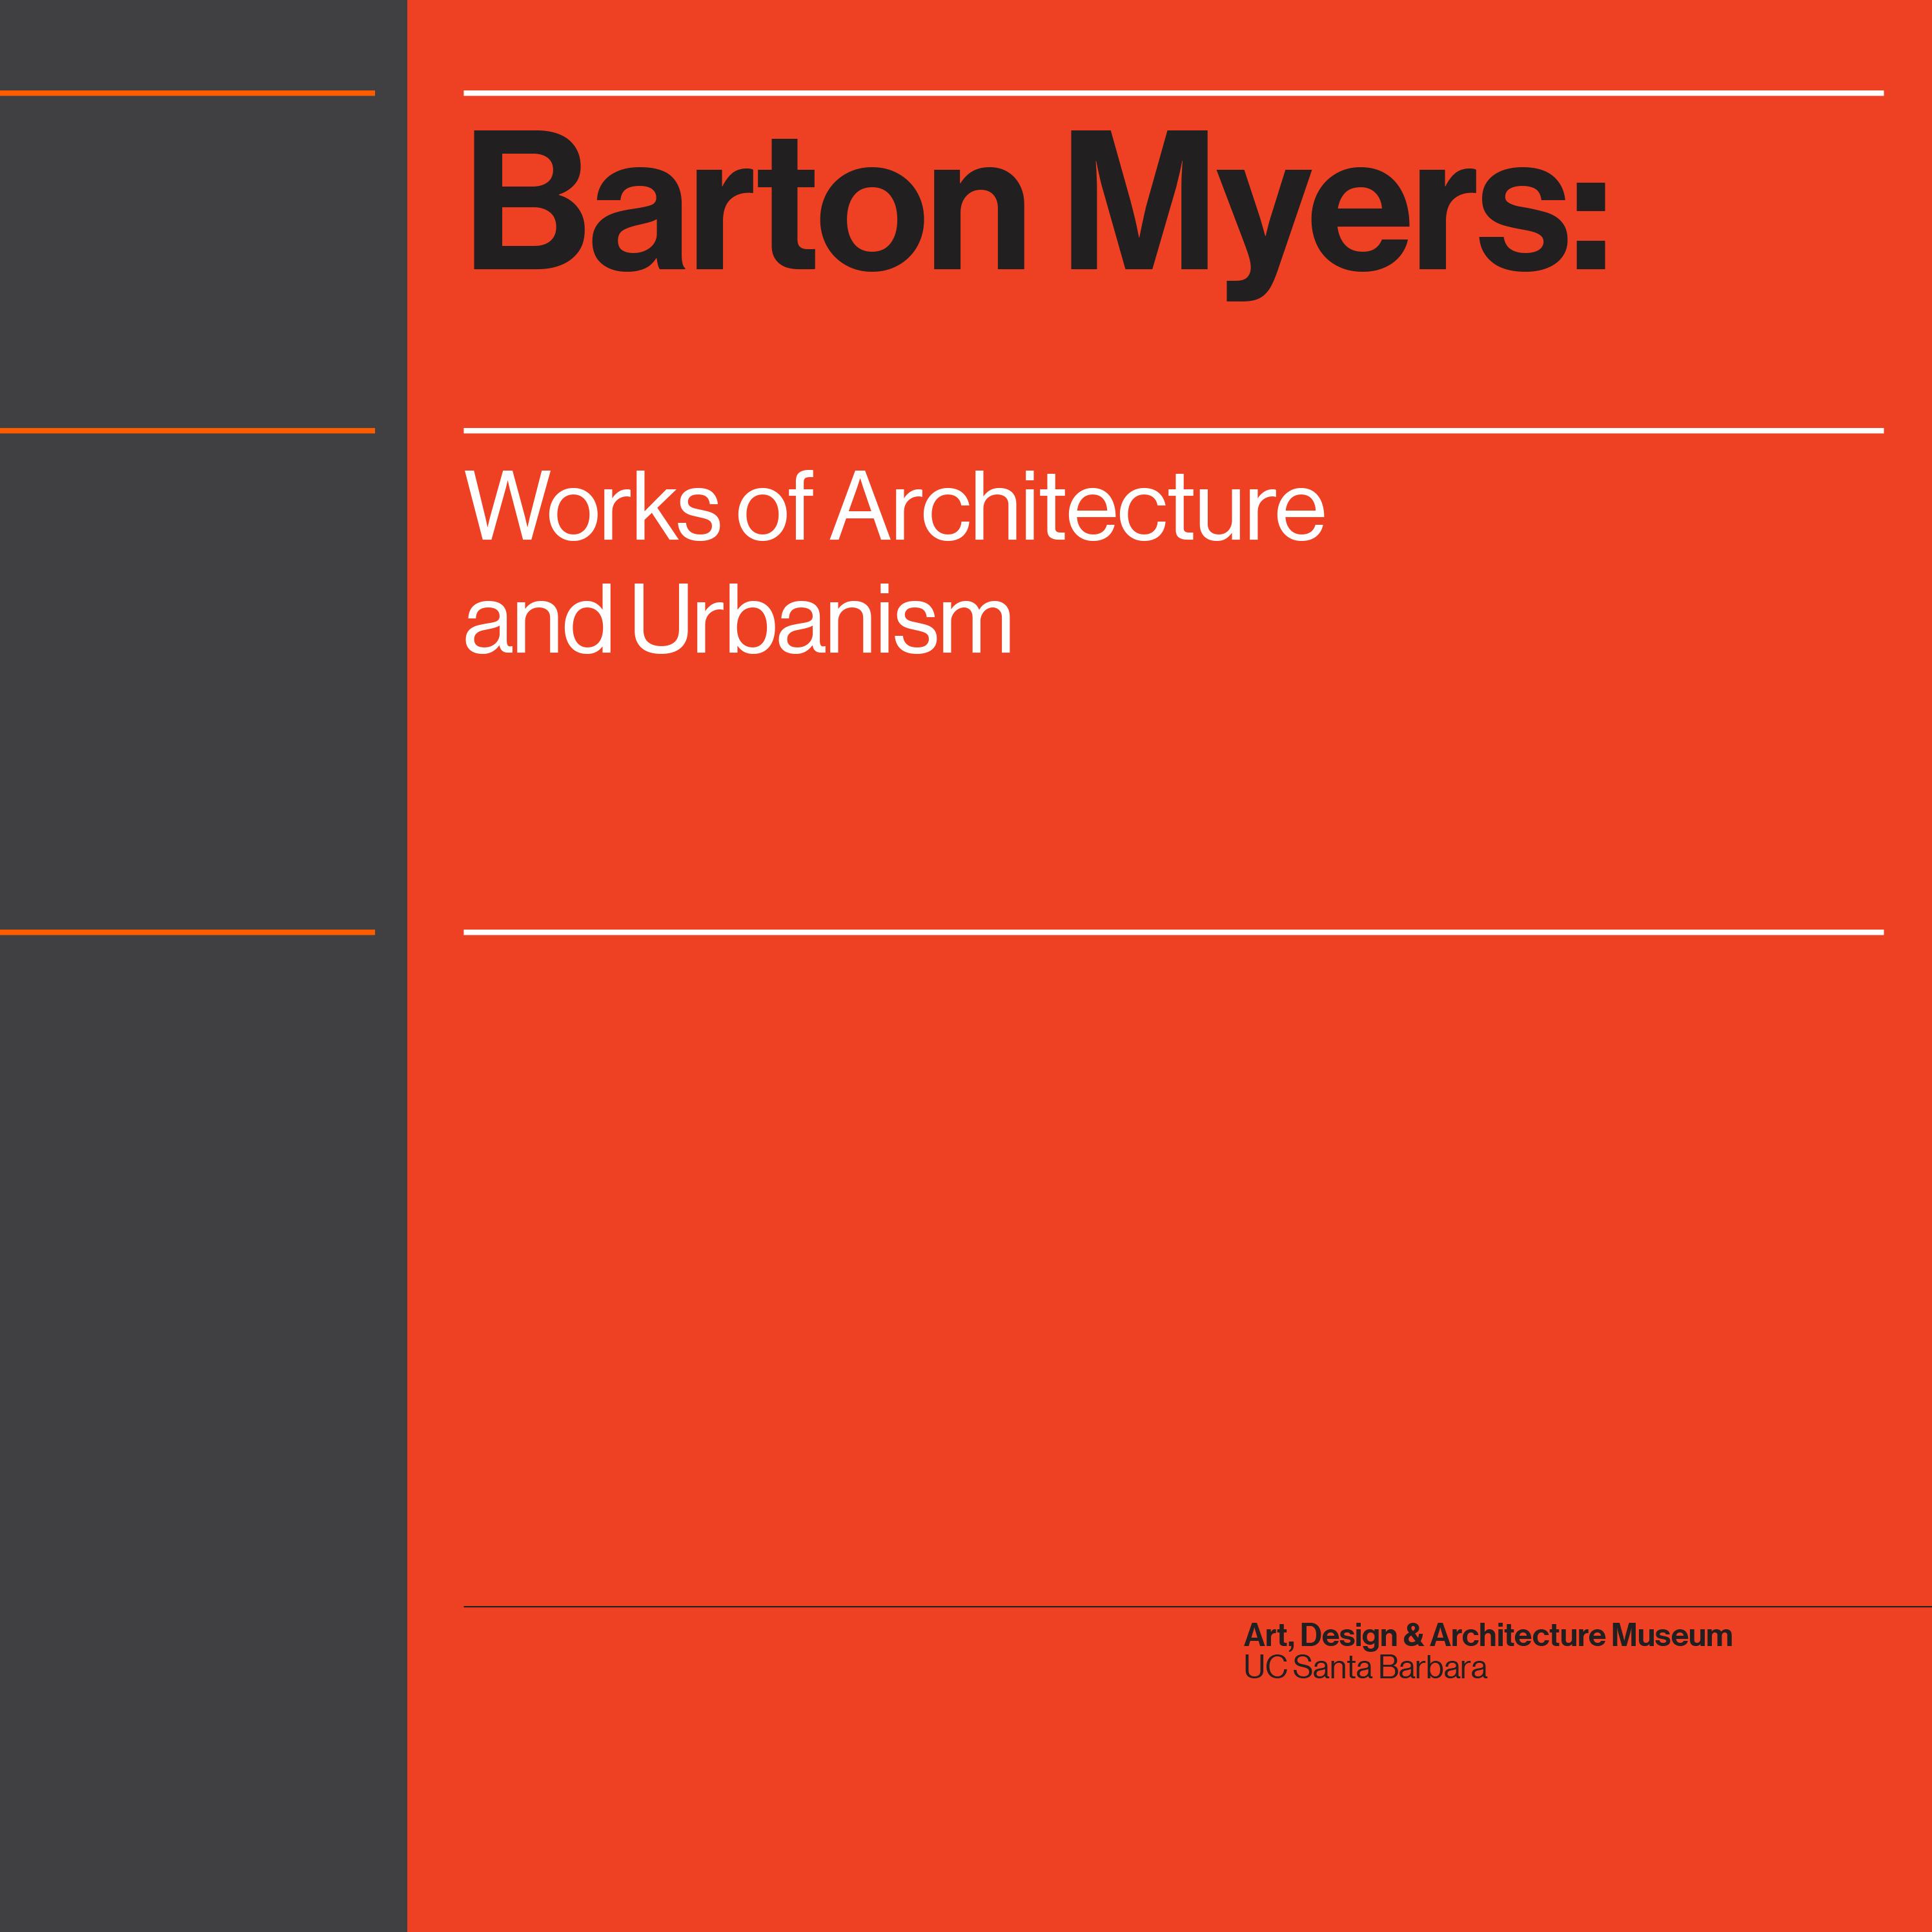 Barton Myers